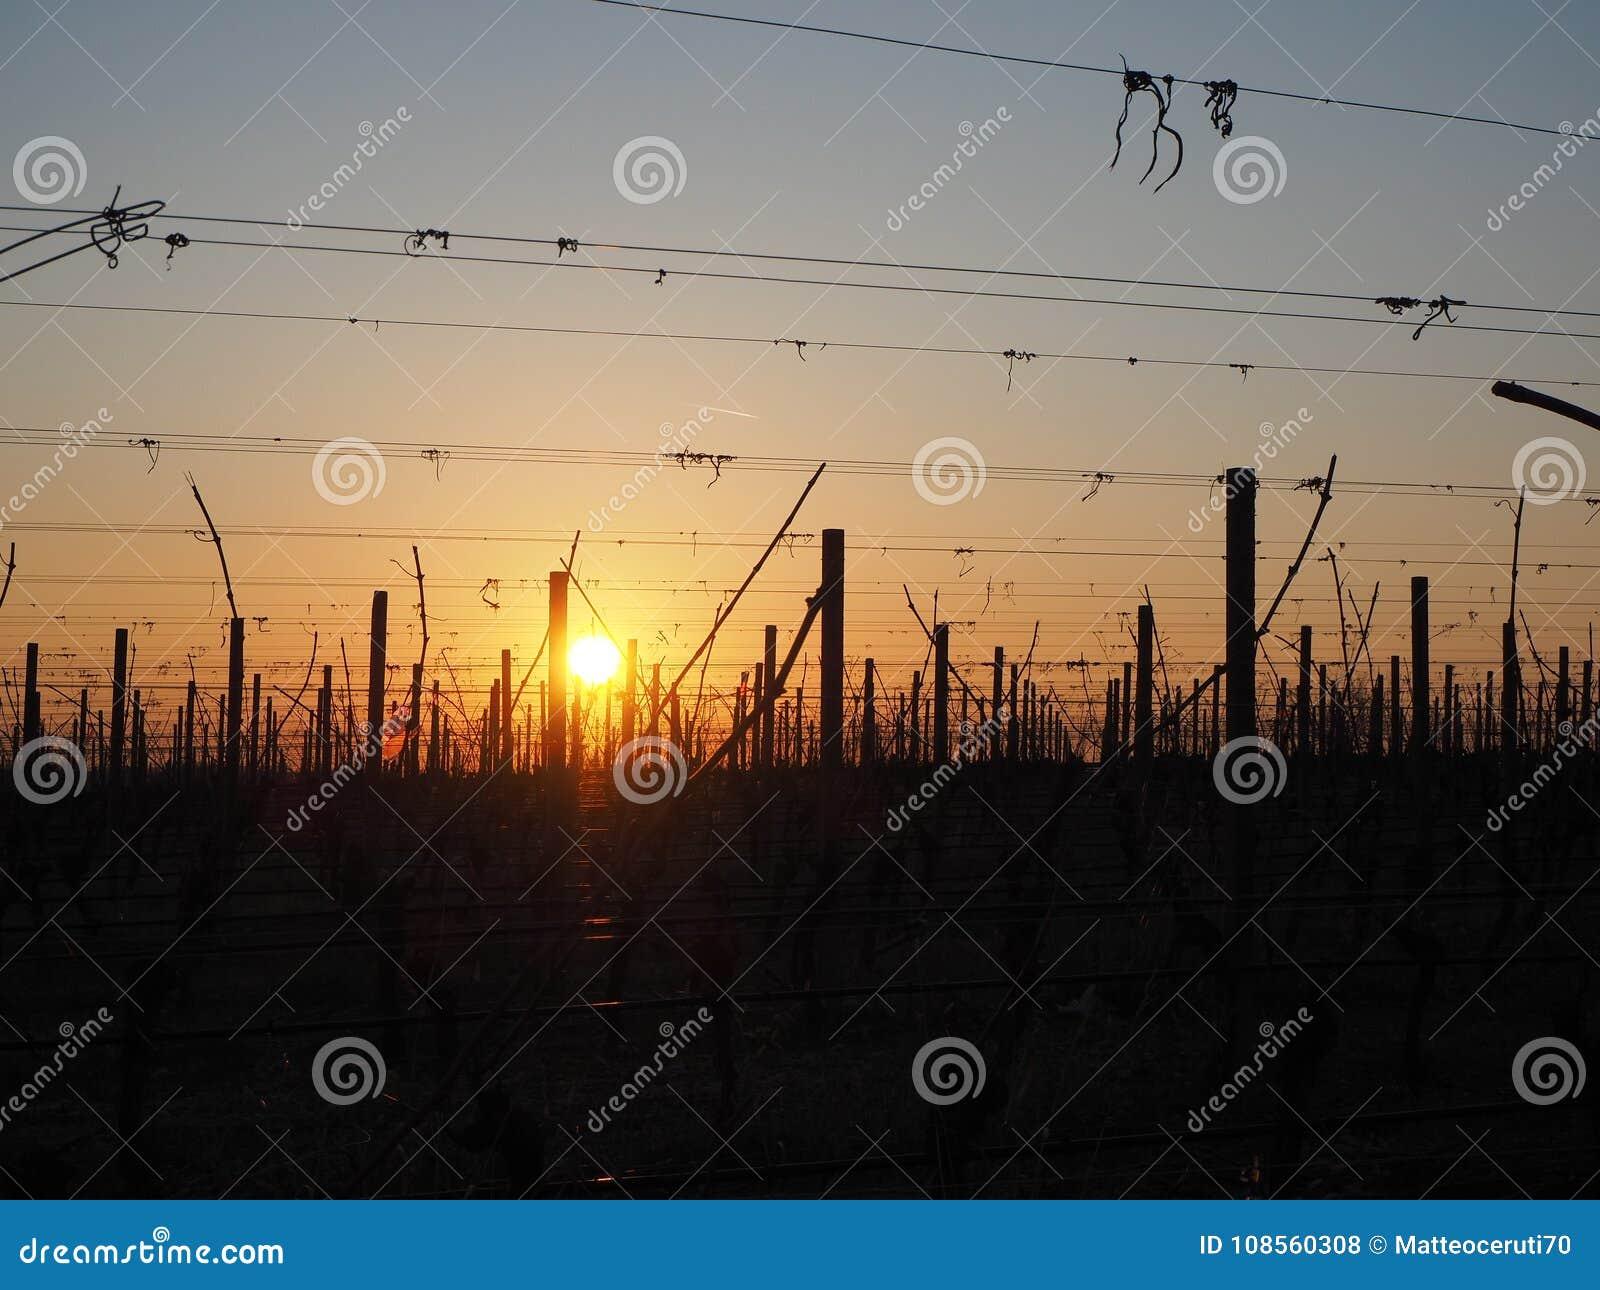 Sunrise in the winter on the hills of the vineyards near Lake Garda